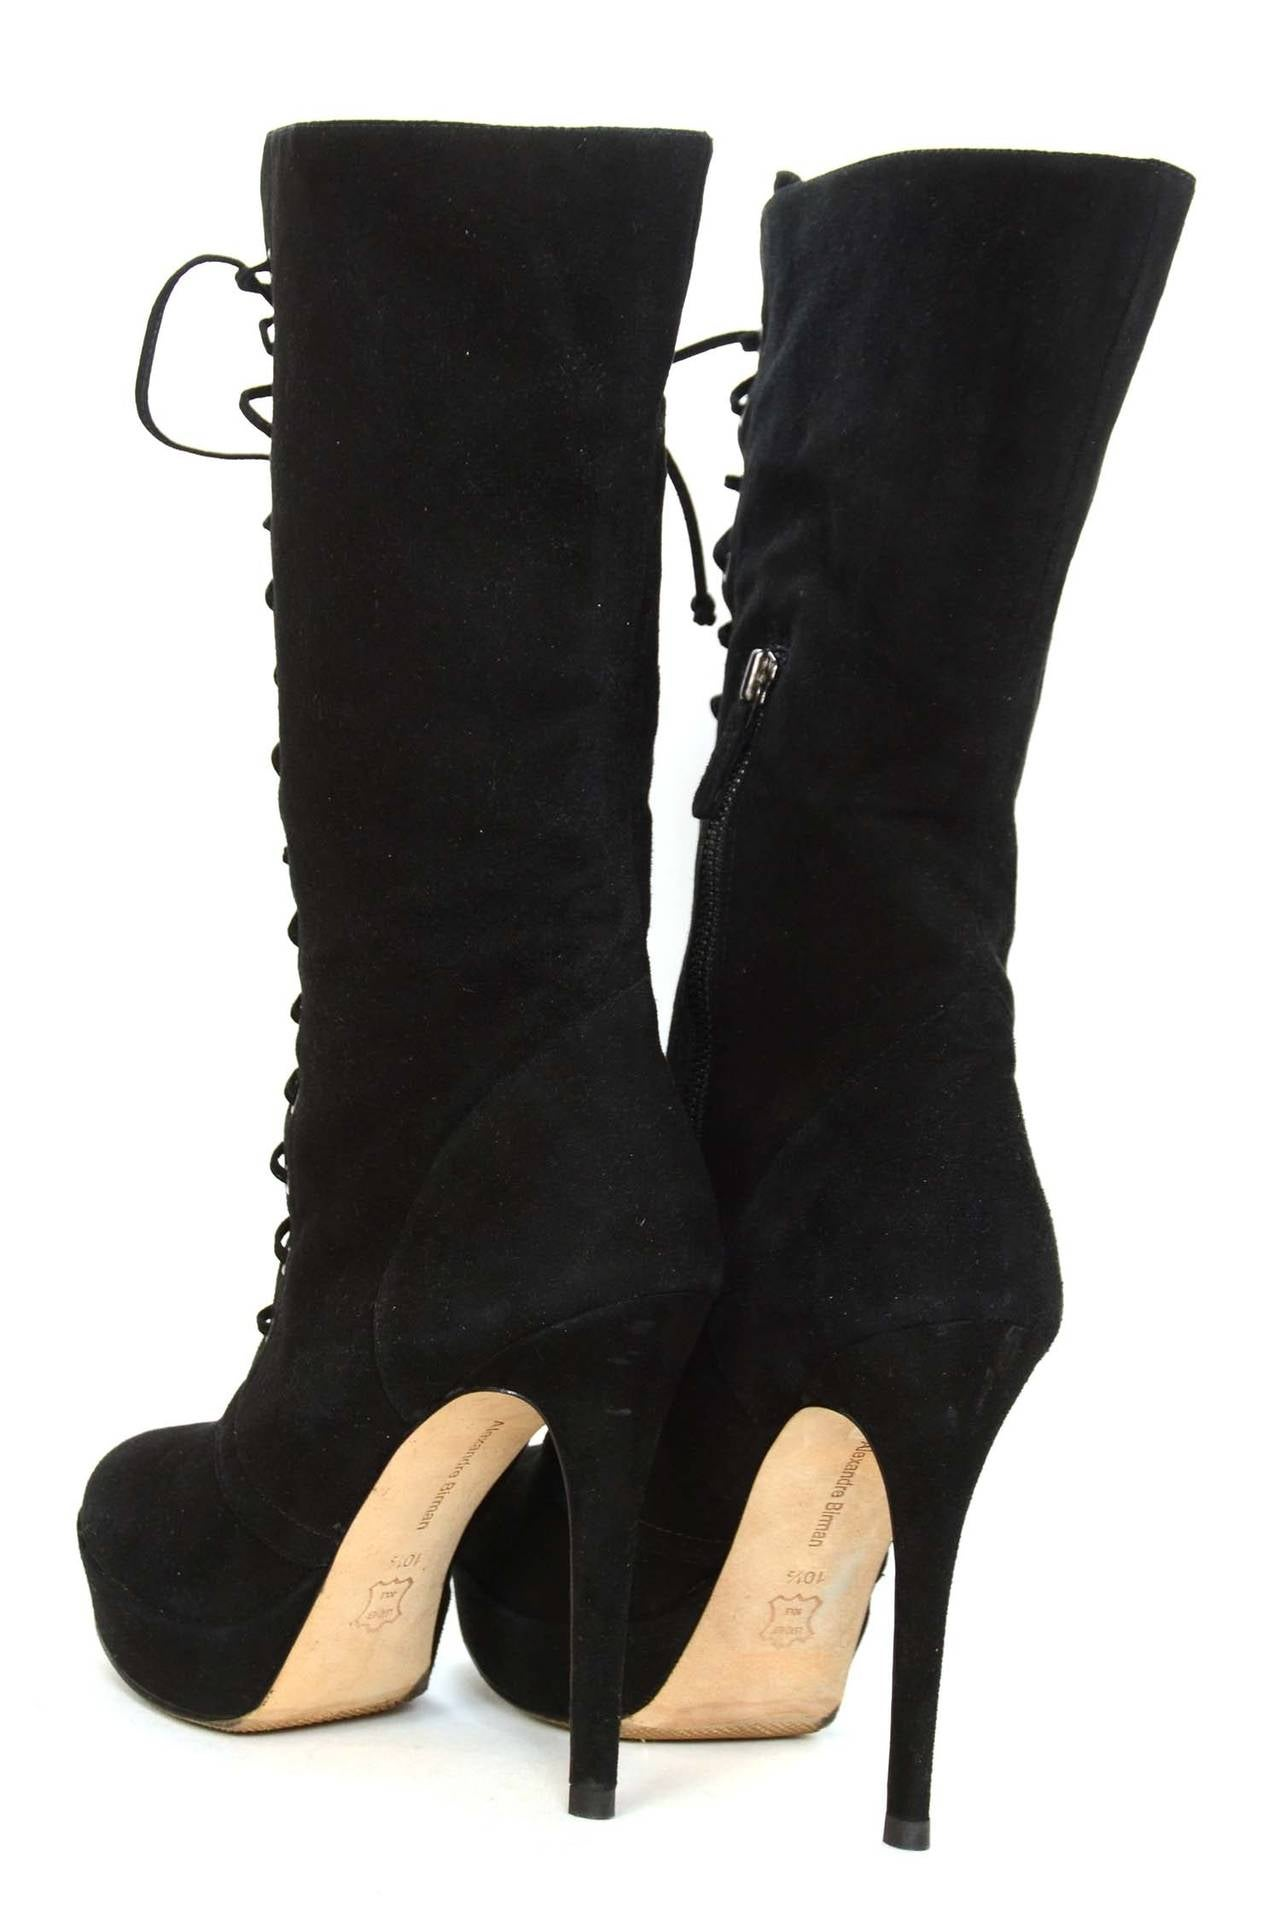 ALEXANDRE BIRMAN Black Suede Lace Up Heeled Boots sz. 10.5 4